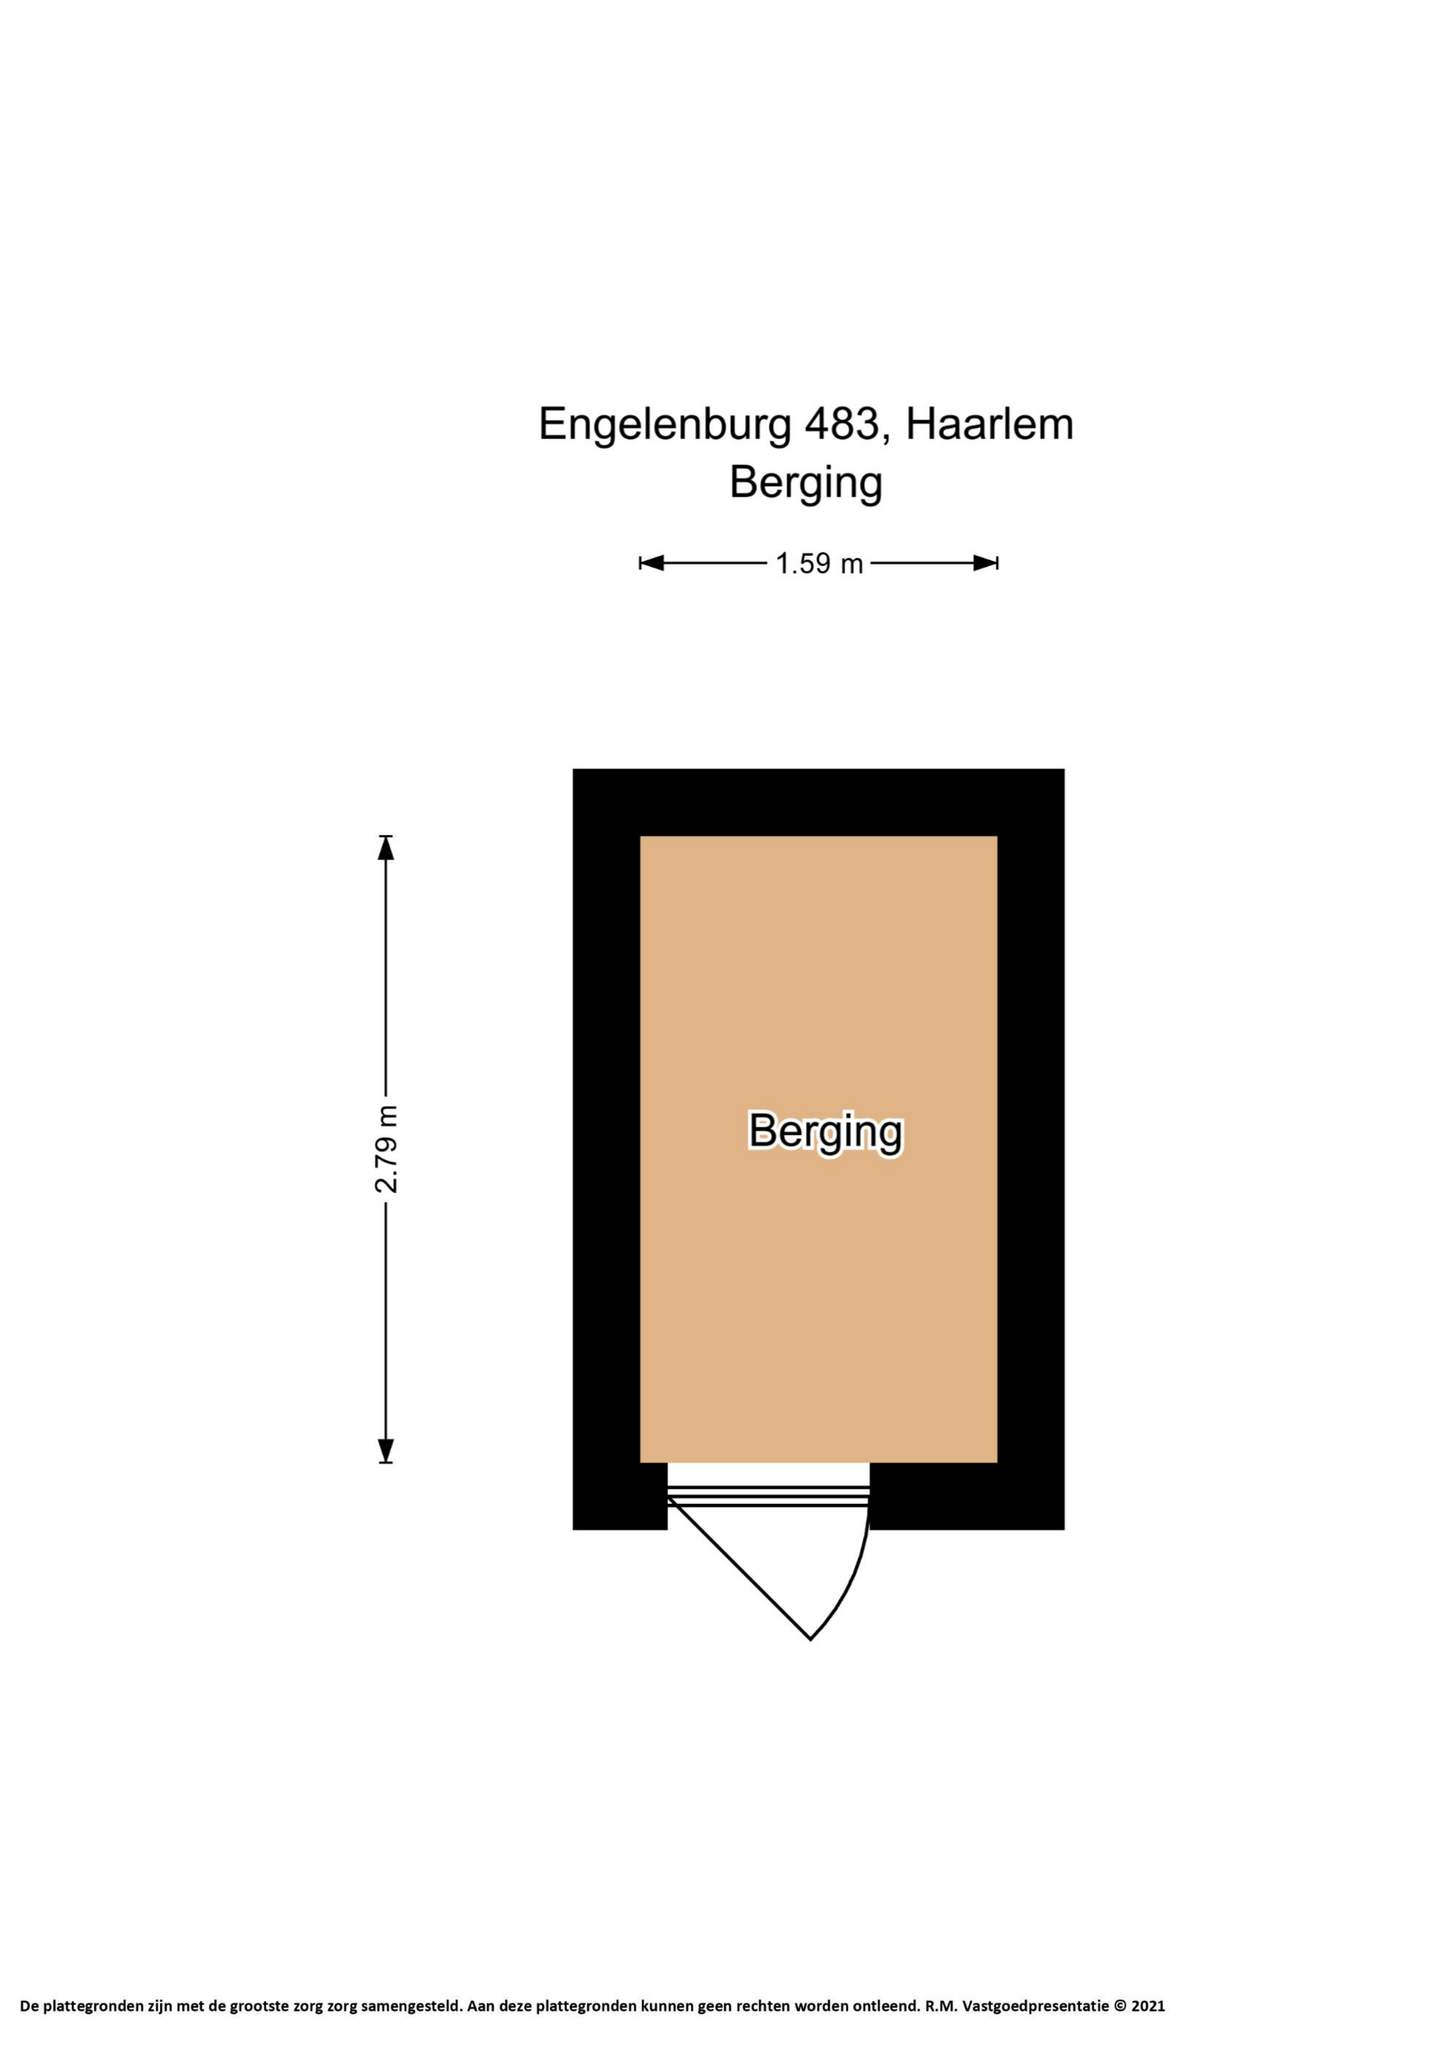 Engelenburg 483